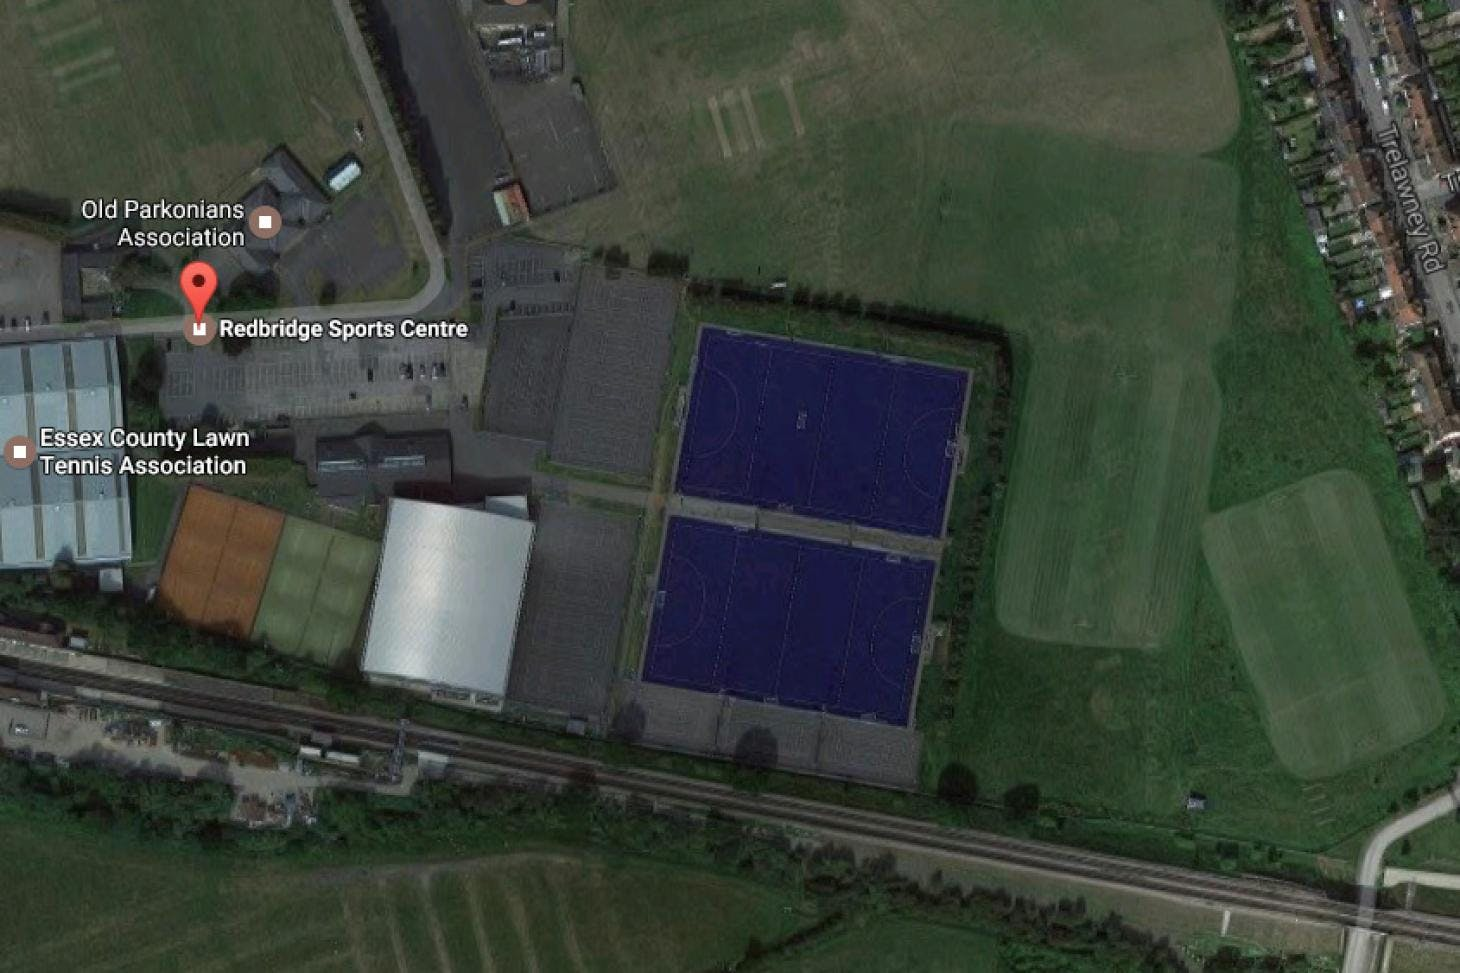 Redbridge Sports Centre Outdoor | Astroturf tennis court